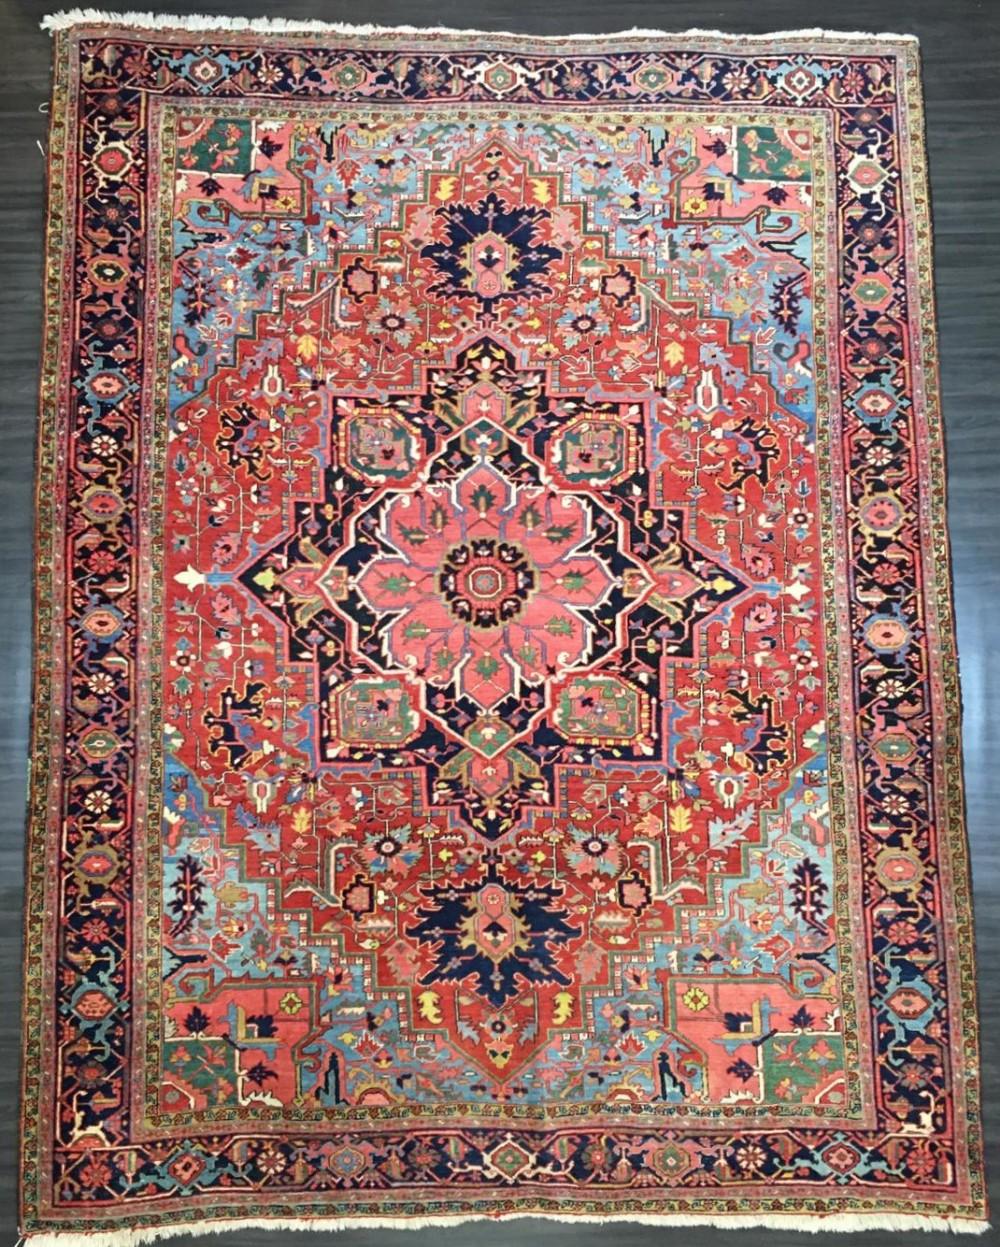 antique heriz carpet country house style great colour circa 1900